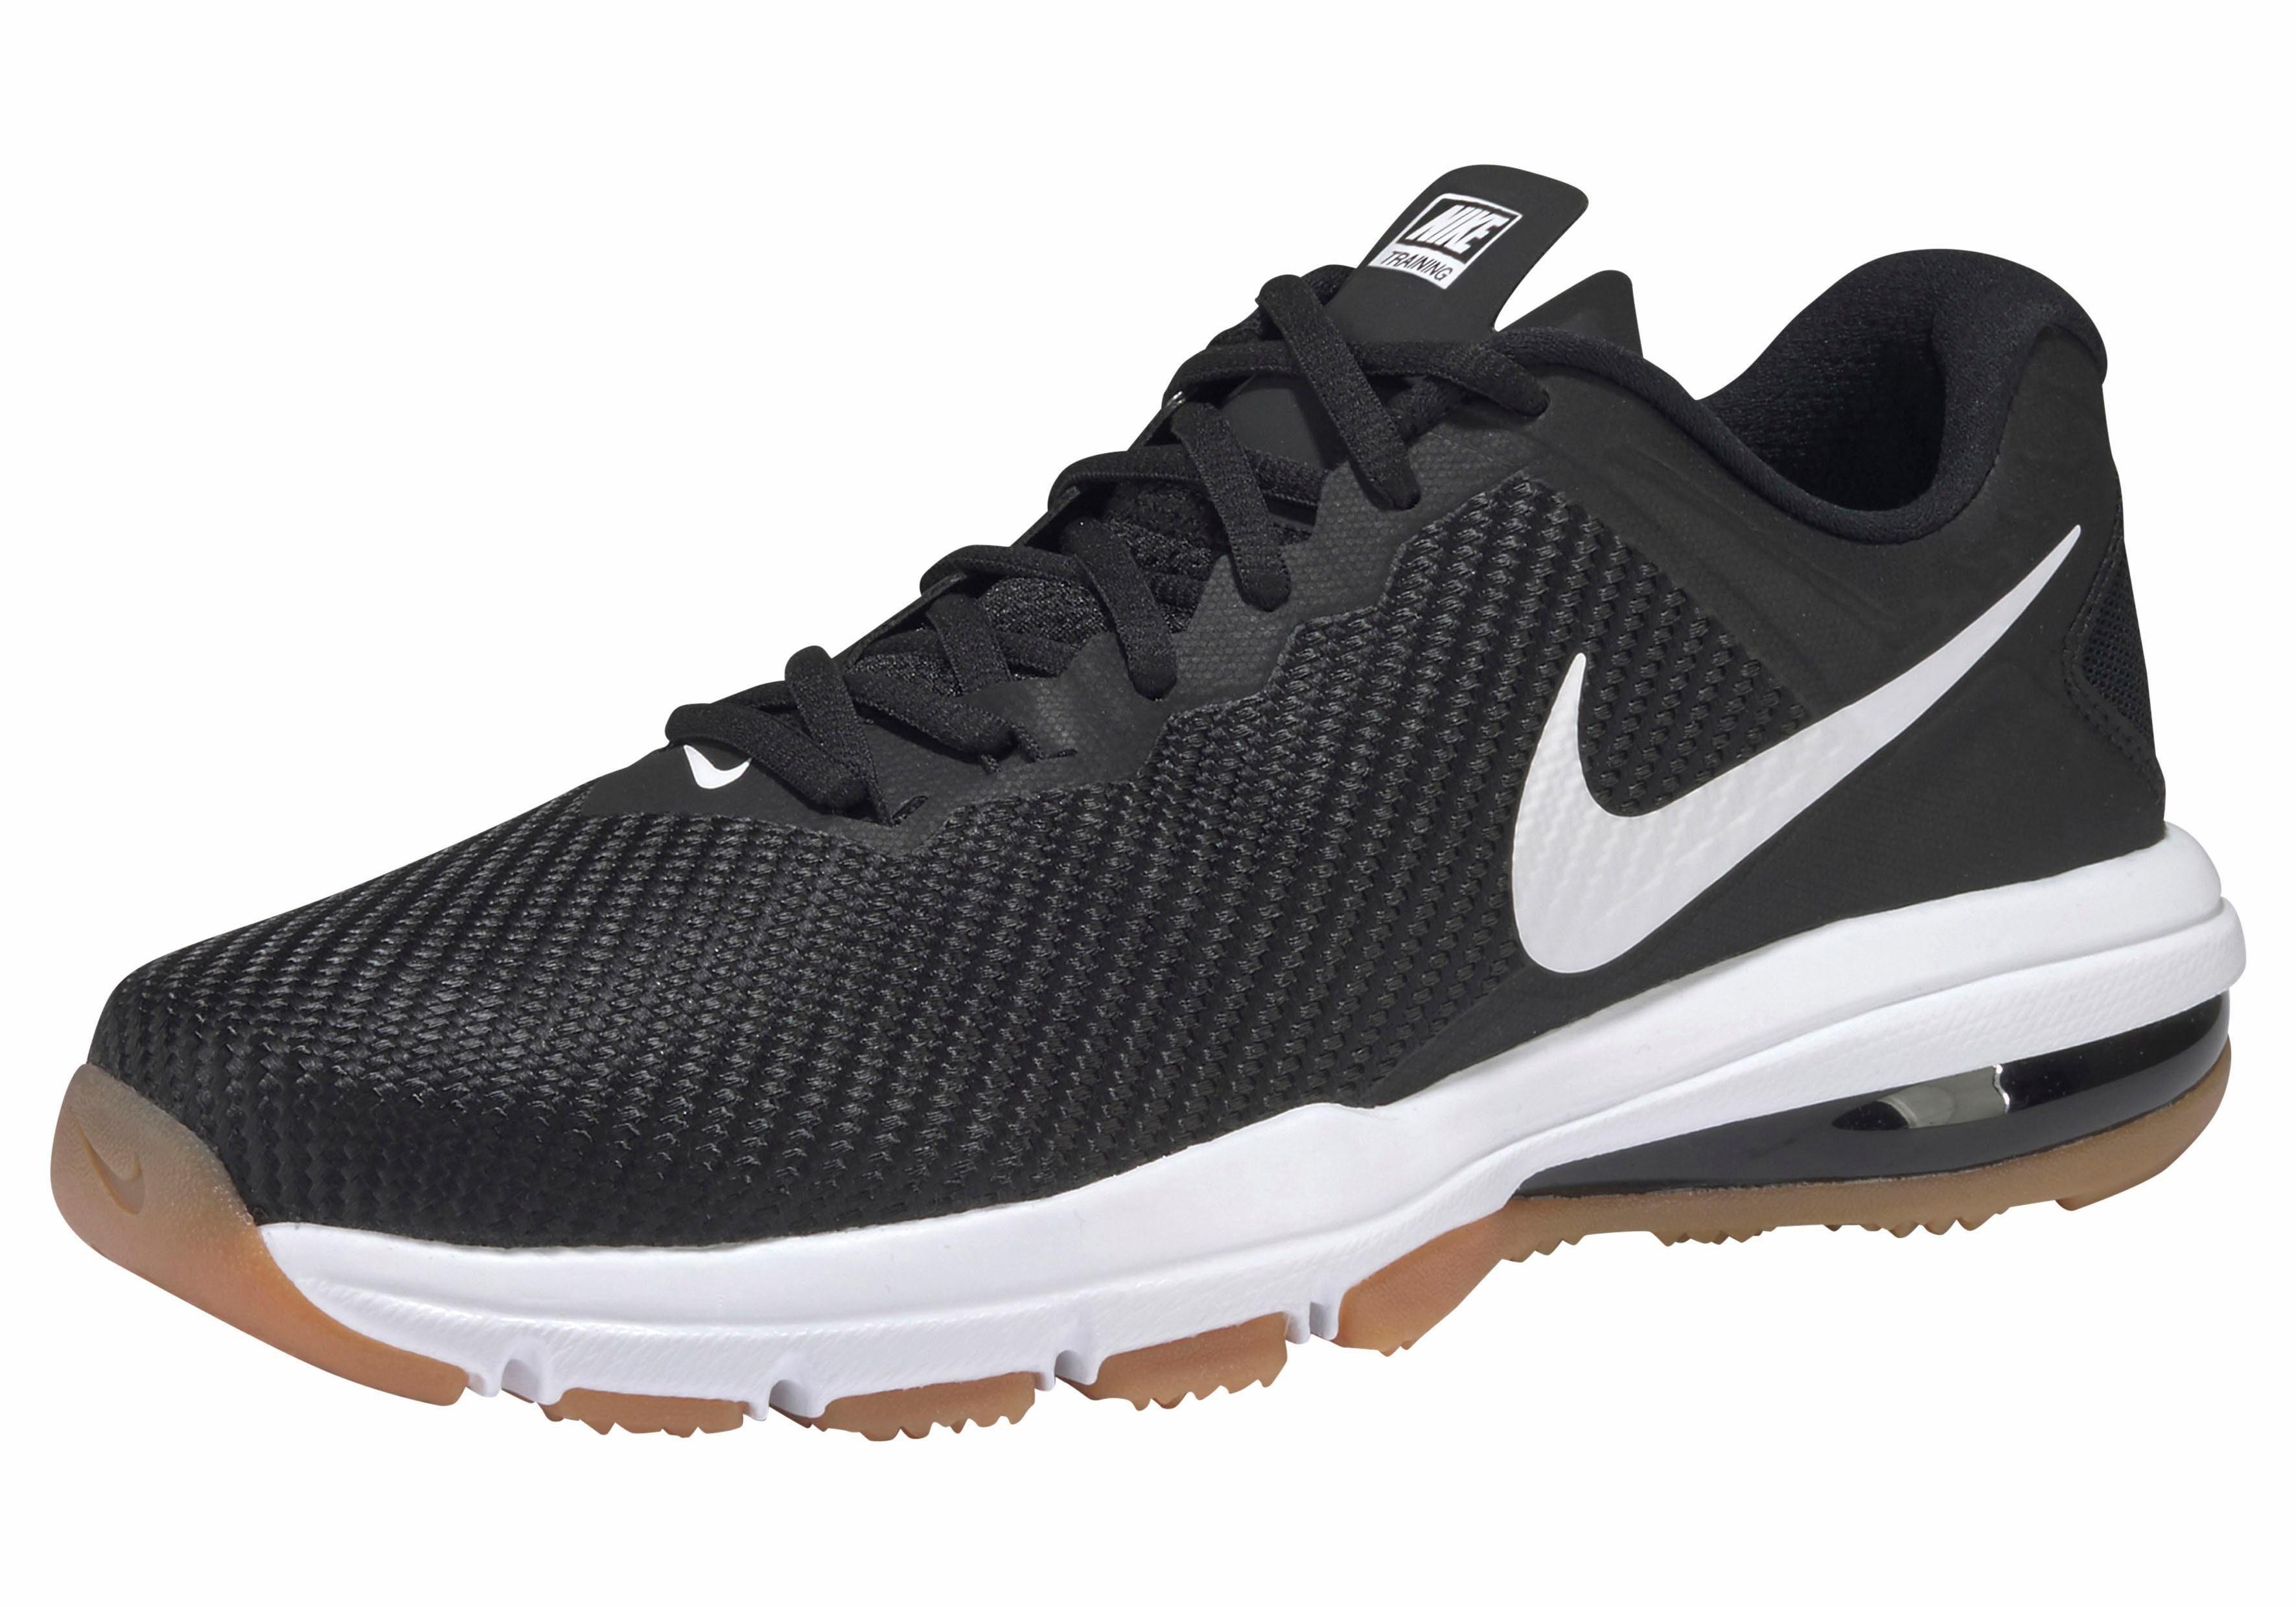 Nike »Air Max Full Ride M« Sneaker online kaufen | OTTO